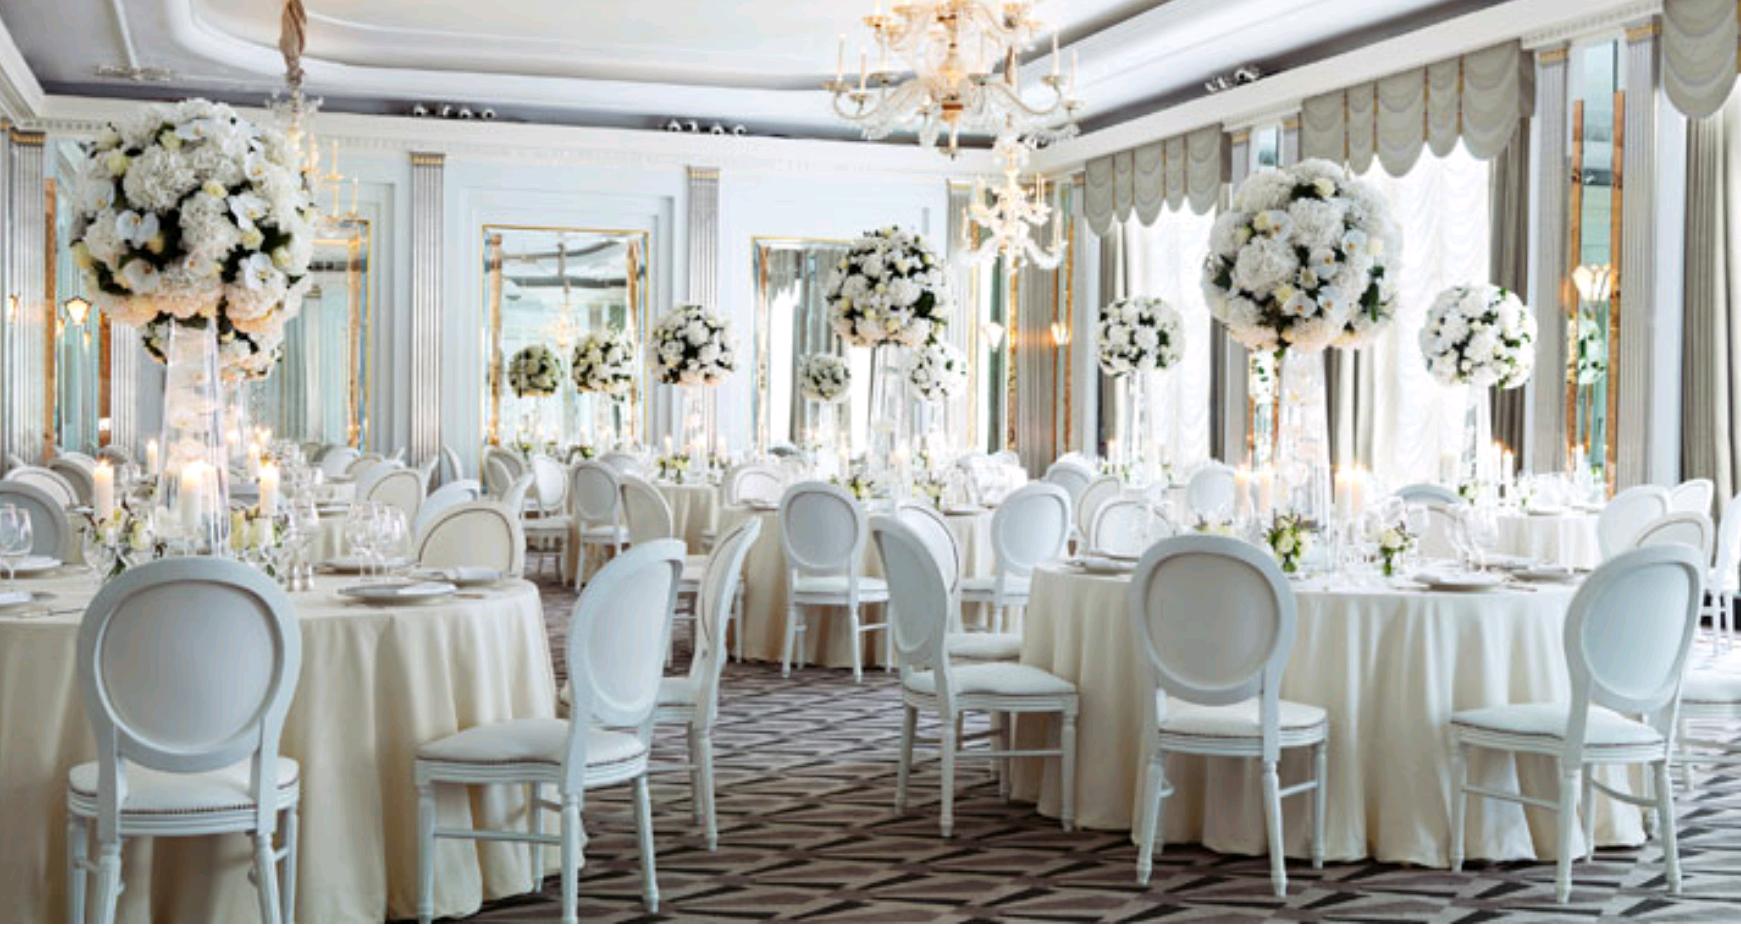 Wedding dinner decoration ideas  Classic but stunning  Luxury Weddings  Pinterest  Wedding venues